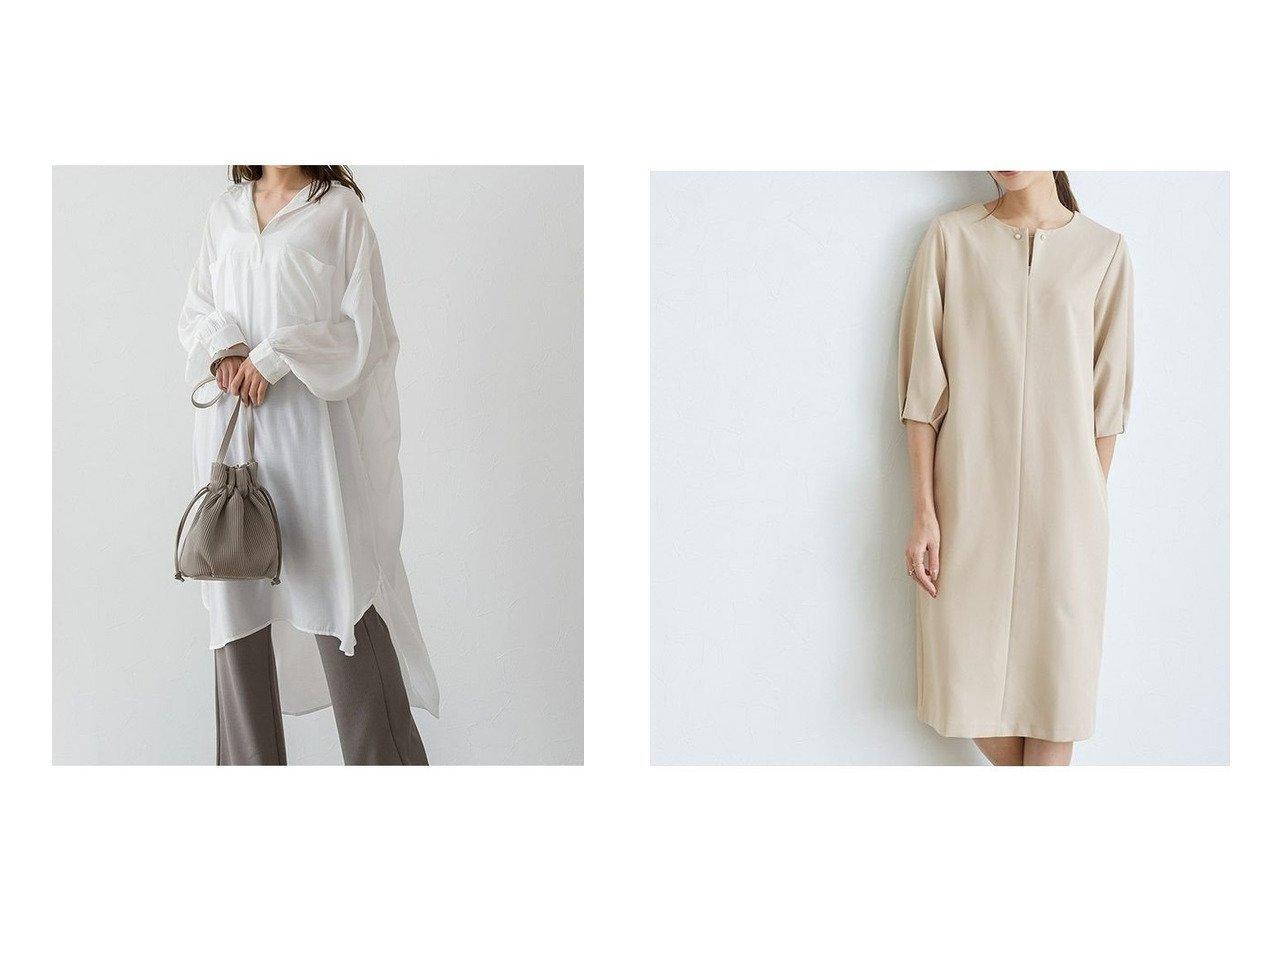 【Pierrot/ピエロ】のヘンリーネックチュニックシャツワンピース MD&キーネックボリュームスリーブワンピース MD おすすめ!人気!プチプライスで上品なファッションアイテムの通販  おすすめで人気の流行・トレンド、ファッションの通販商品 メンズファッション・キッズファッション・インテリア・家具・レディースファッション・服の通販 founy(ファニー) https://founy.com/ ファッション Fashion レディースファッション WOMEN ワンピース Dress シャツワンピース Shirt Dresses チュニック Tunic トレンド プチプライス・低価格 Affordable  ID:crp329100000021280